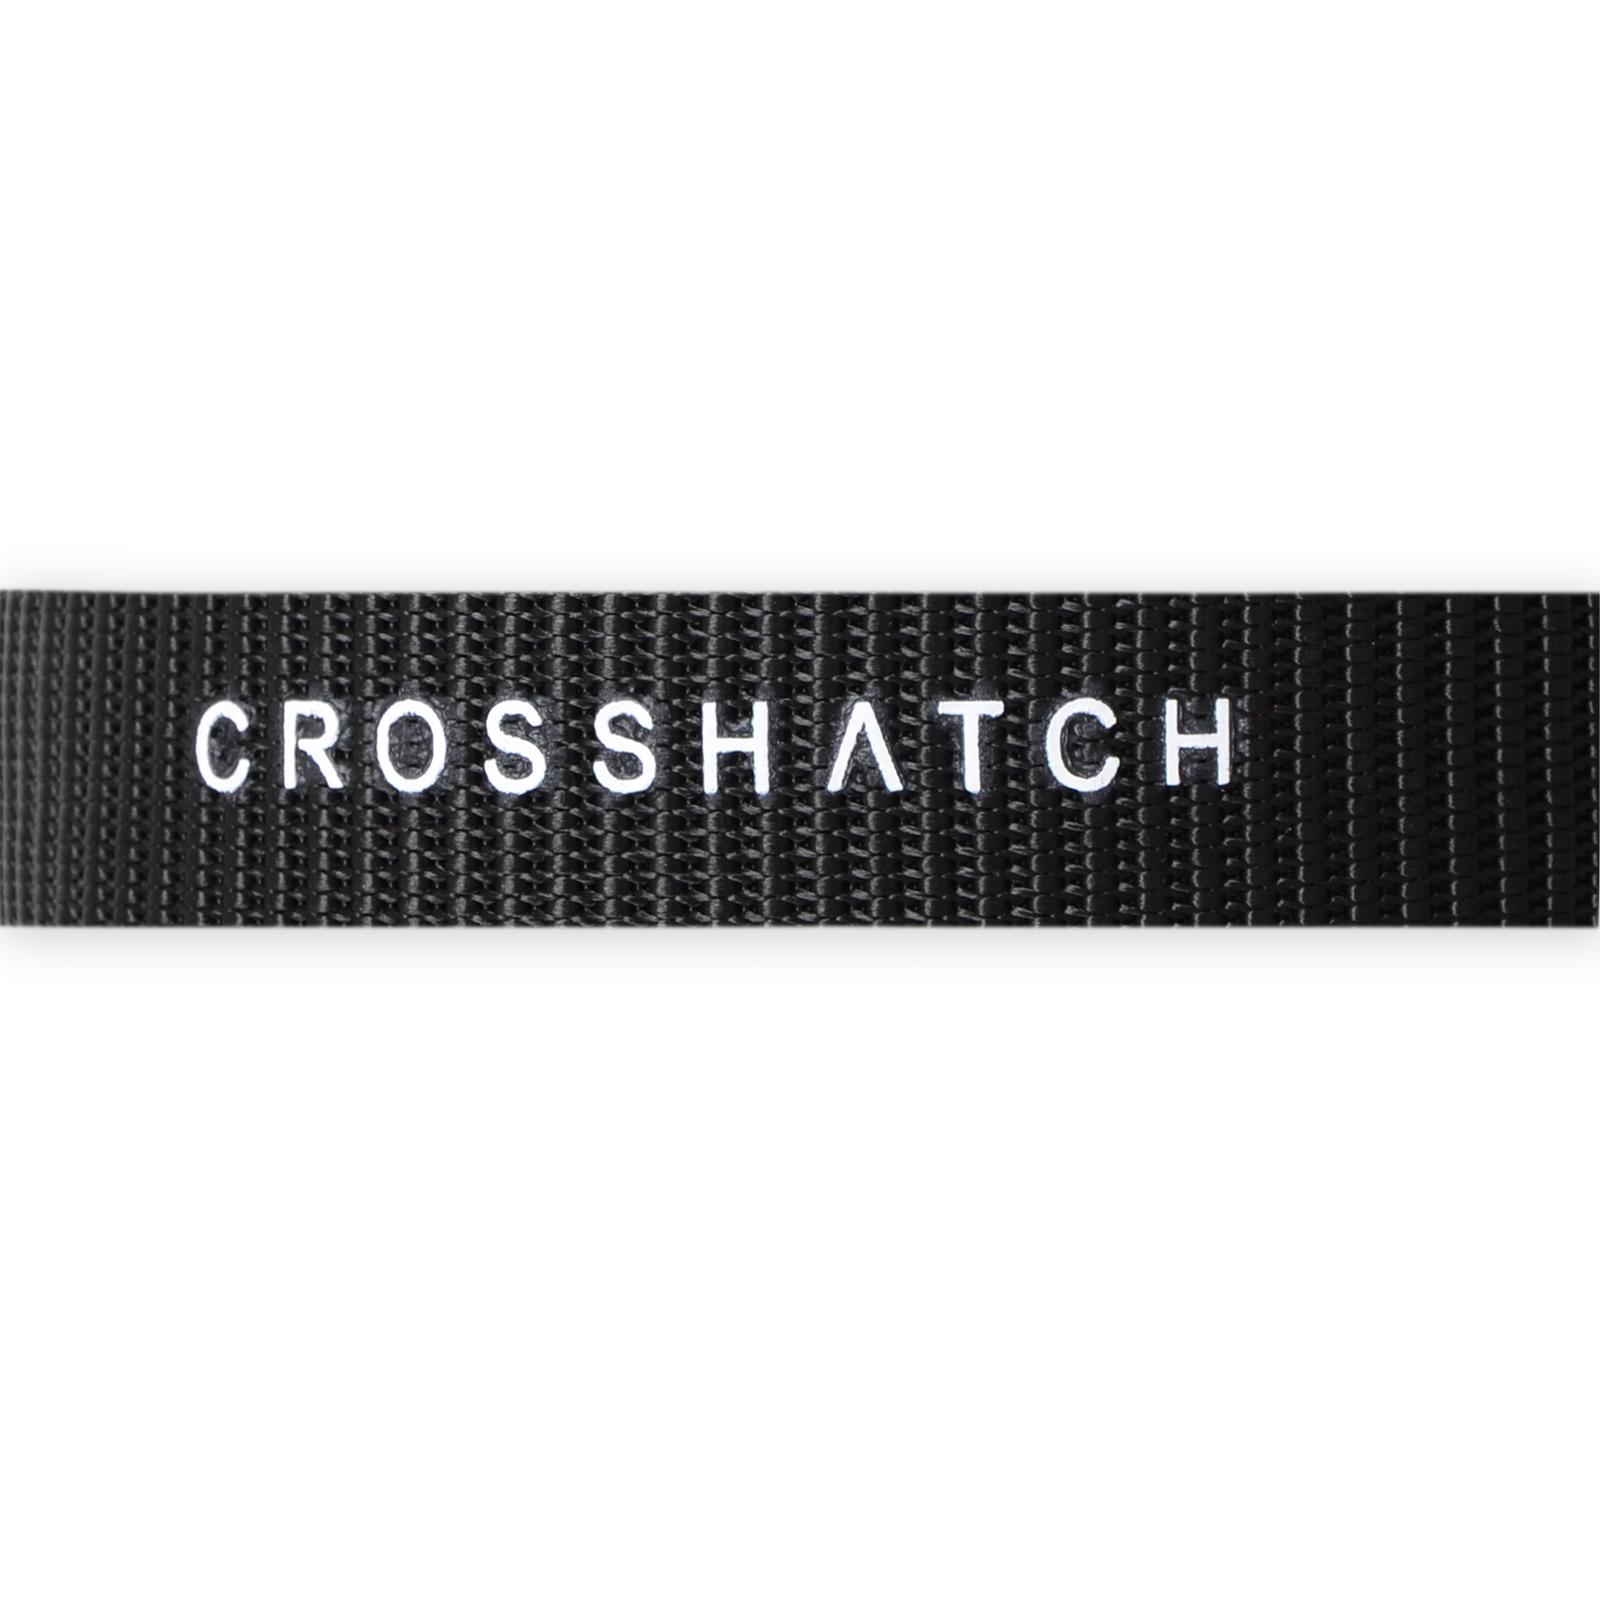 Crosshatch Mens Chucker Designer Branded Embossed PU Leather Metal Buckle Belt